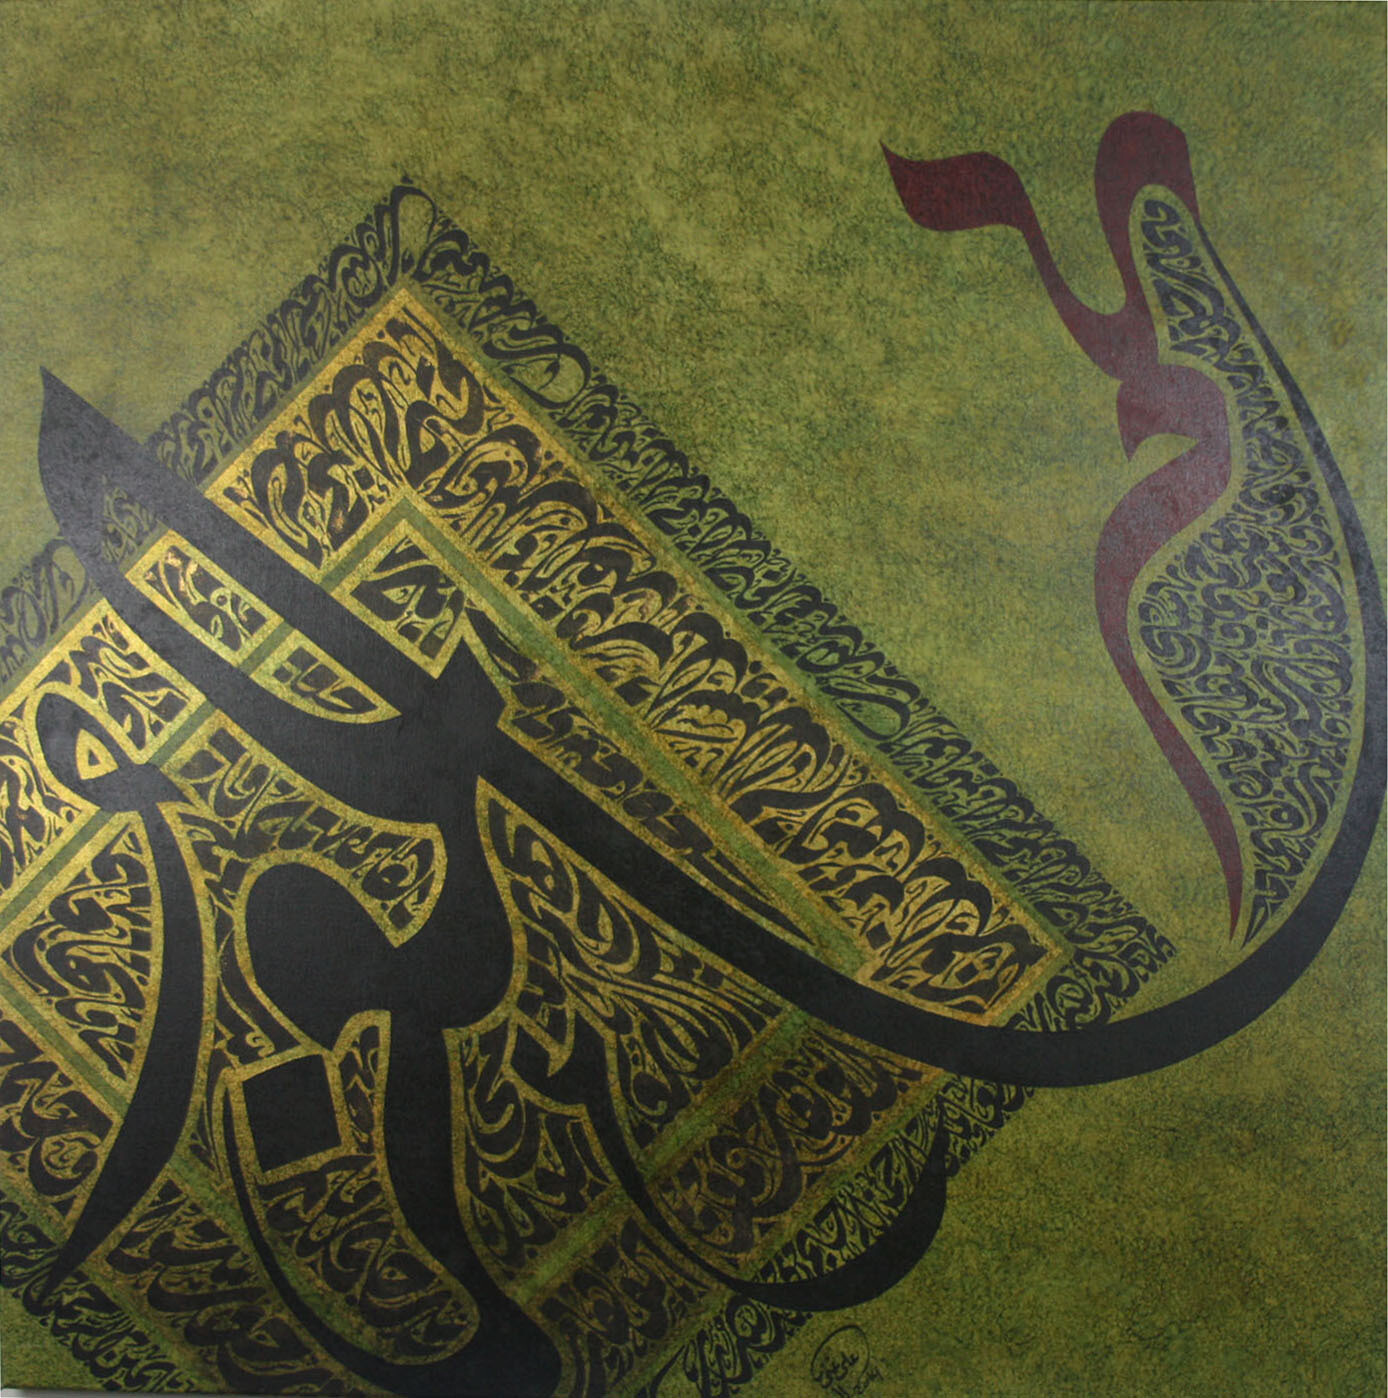 Al Muizz Gold Foiling Textured Art Original Hand Painted Canvas